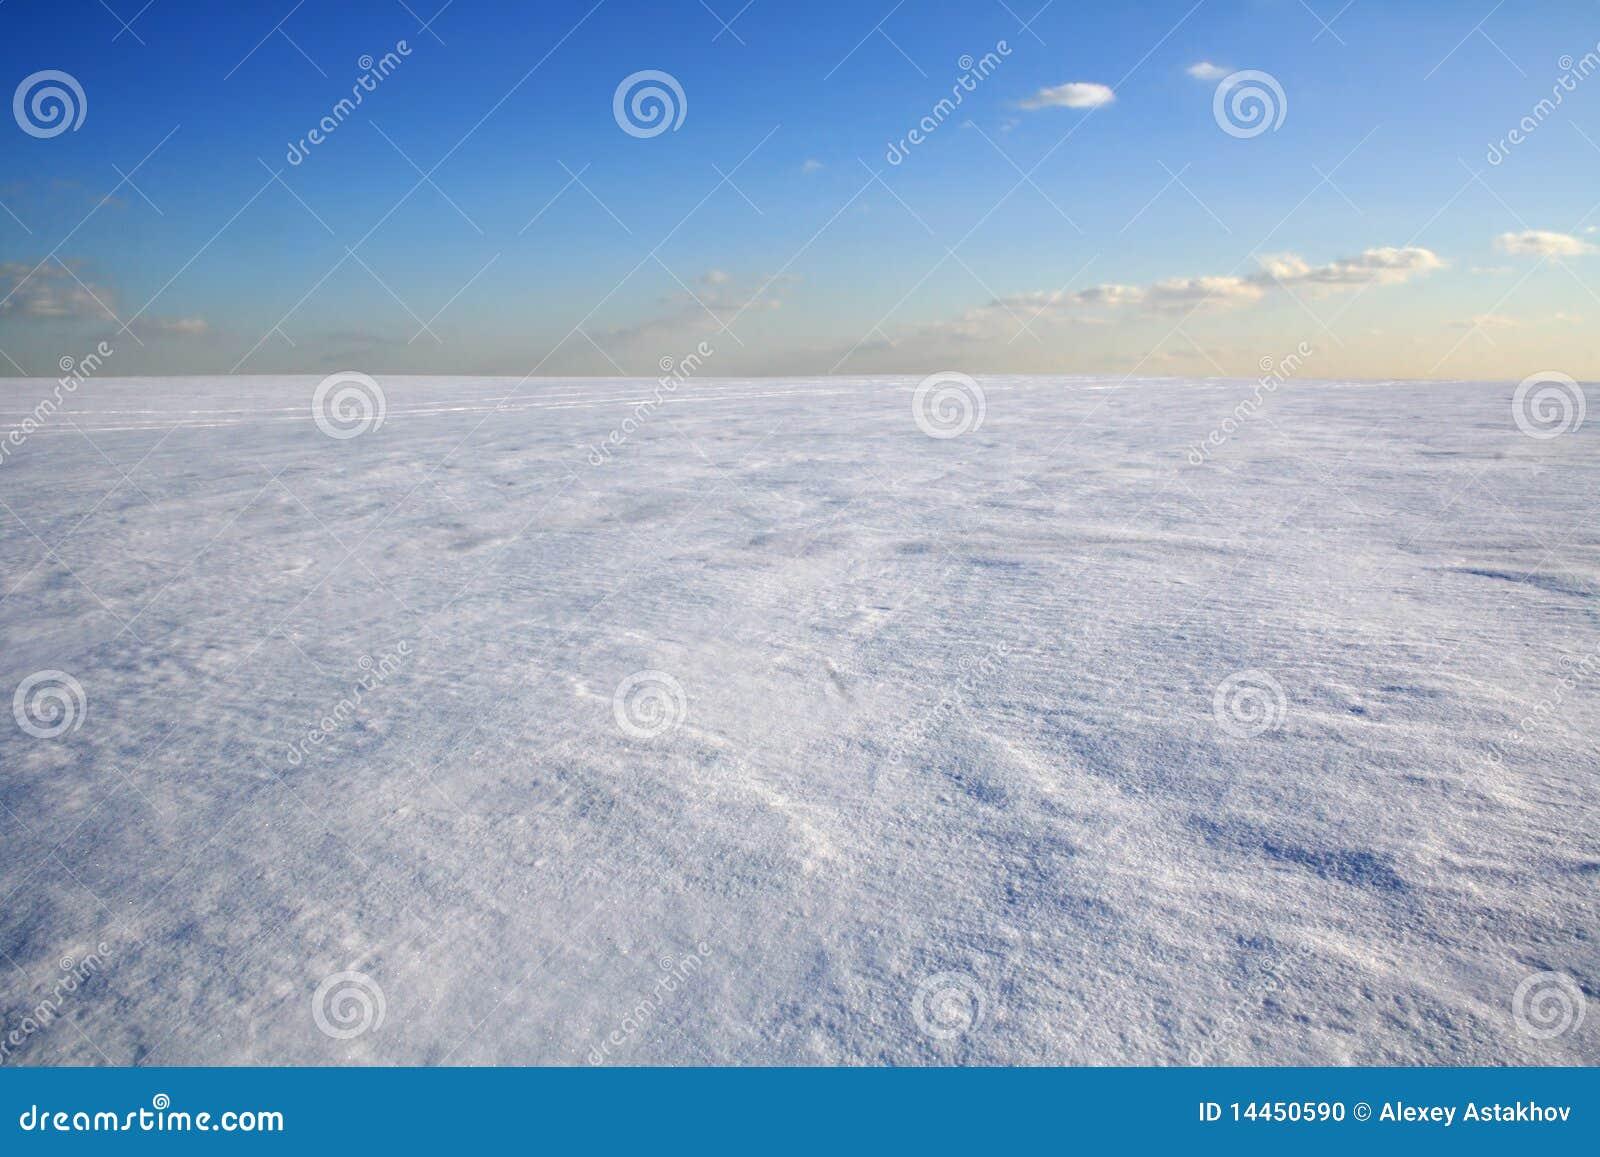 désert froid